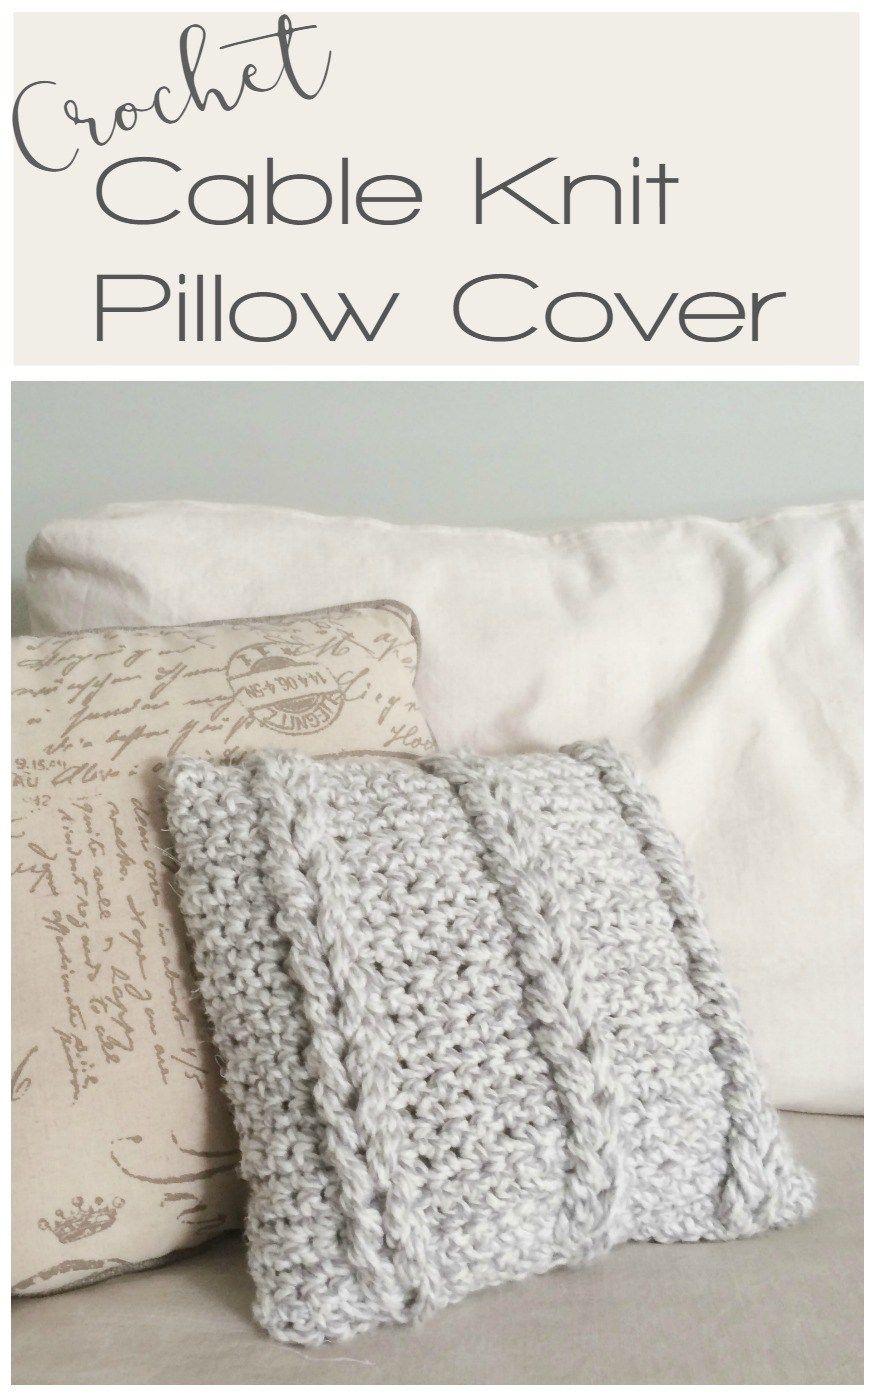 Crochet chain links pillow cover knit pillow free crochet and crochet cable knit pillow cover free crochet pattern bankloansurffo Images